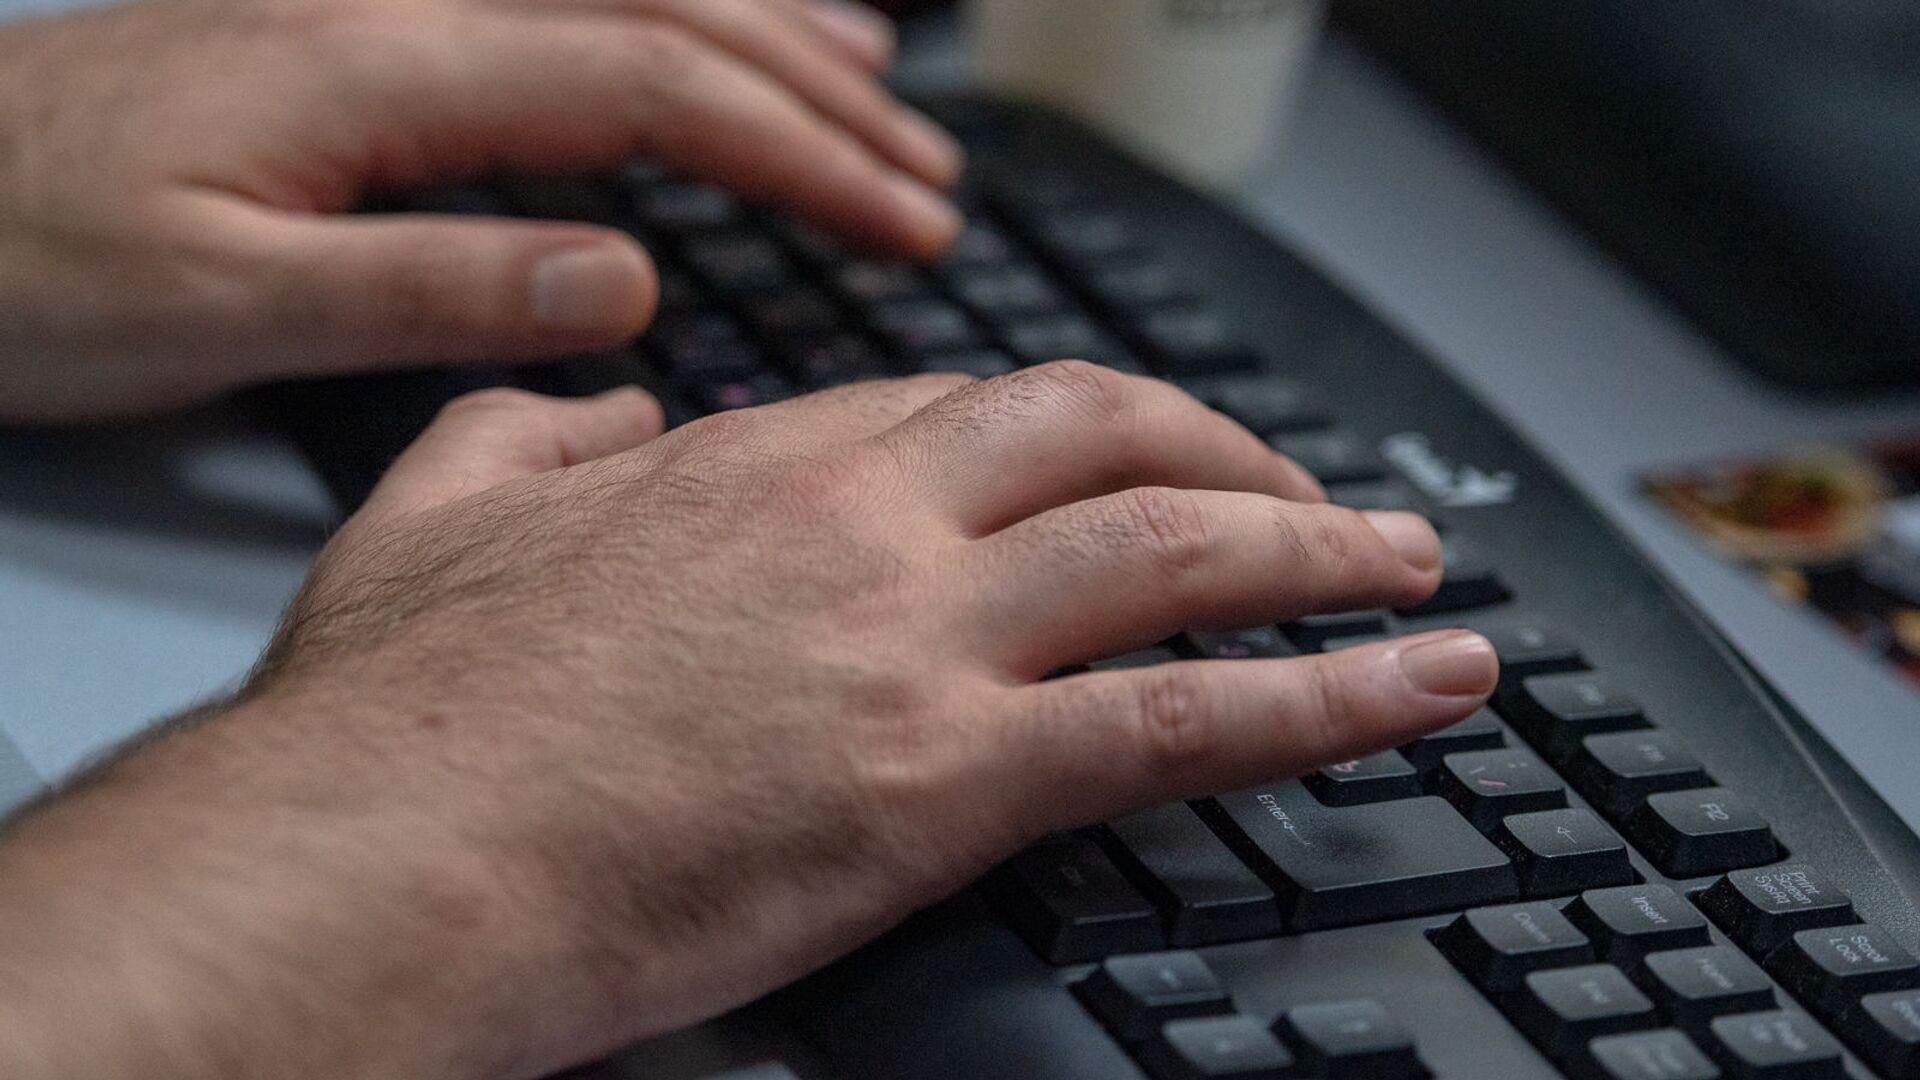 Руки на клавиатуре компьютера - Sputnik Армения, 1920, 21.09.2021